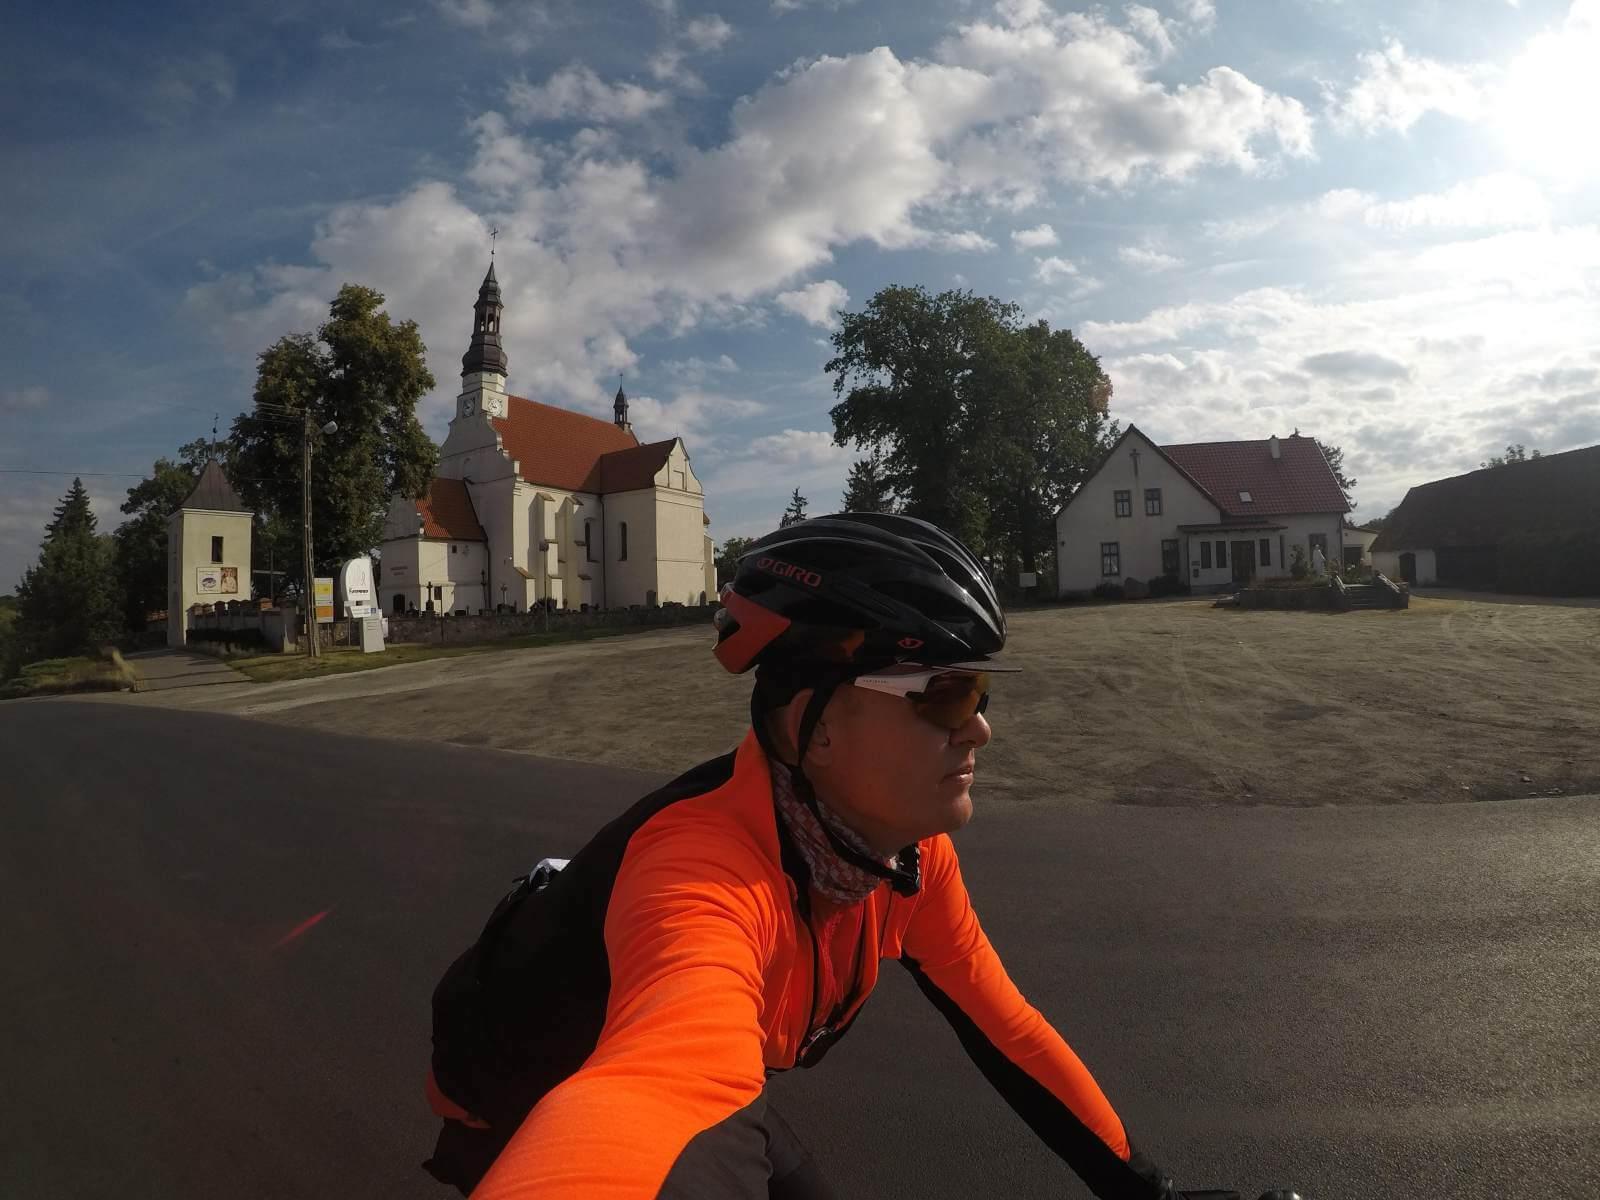 Westerplatte - Ja ikościółek